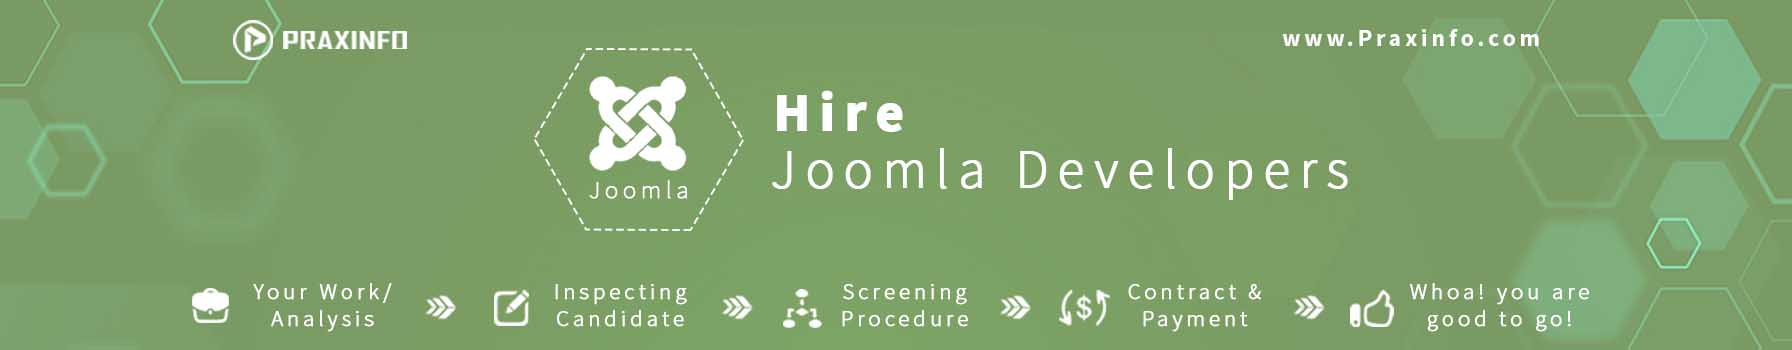 hire-Joomla-developer-banner.jpg